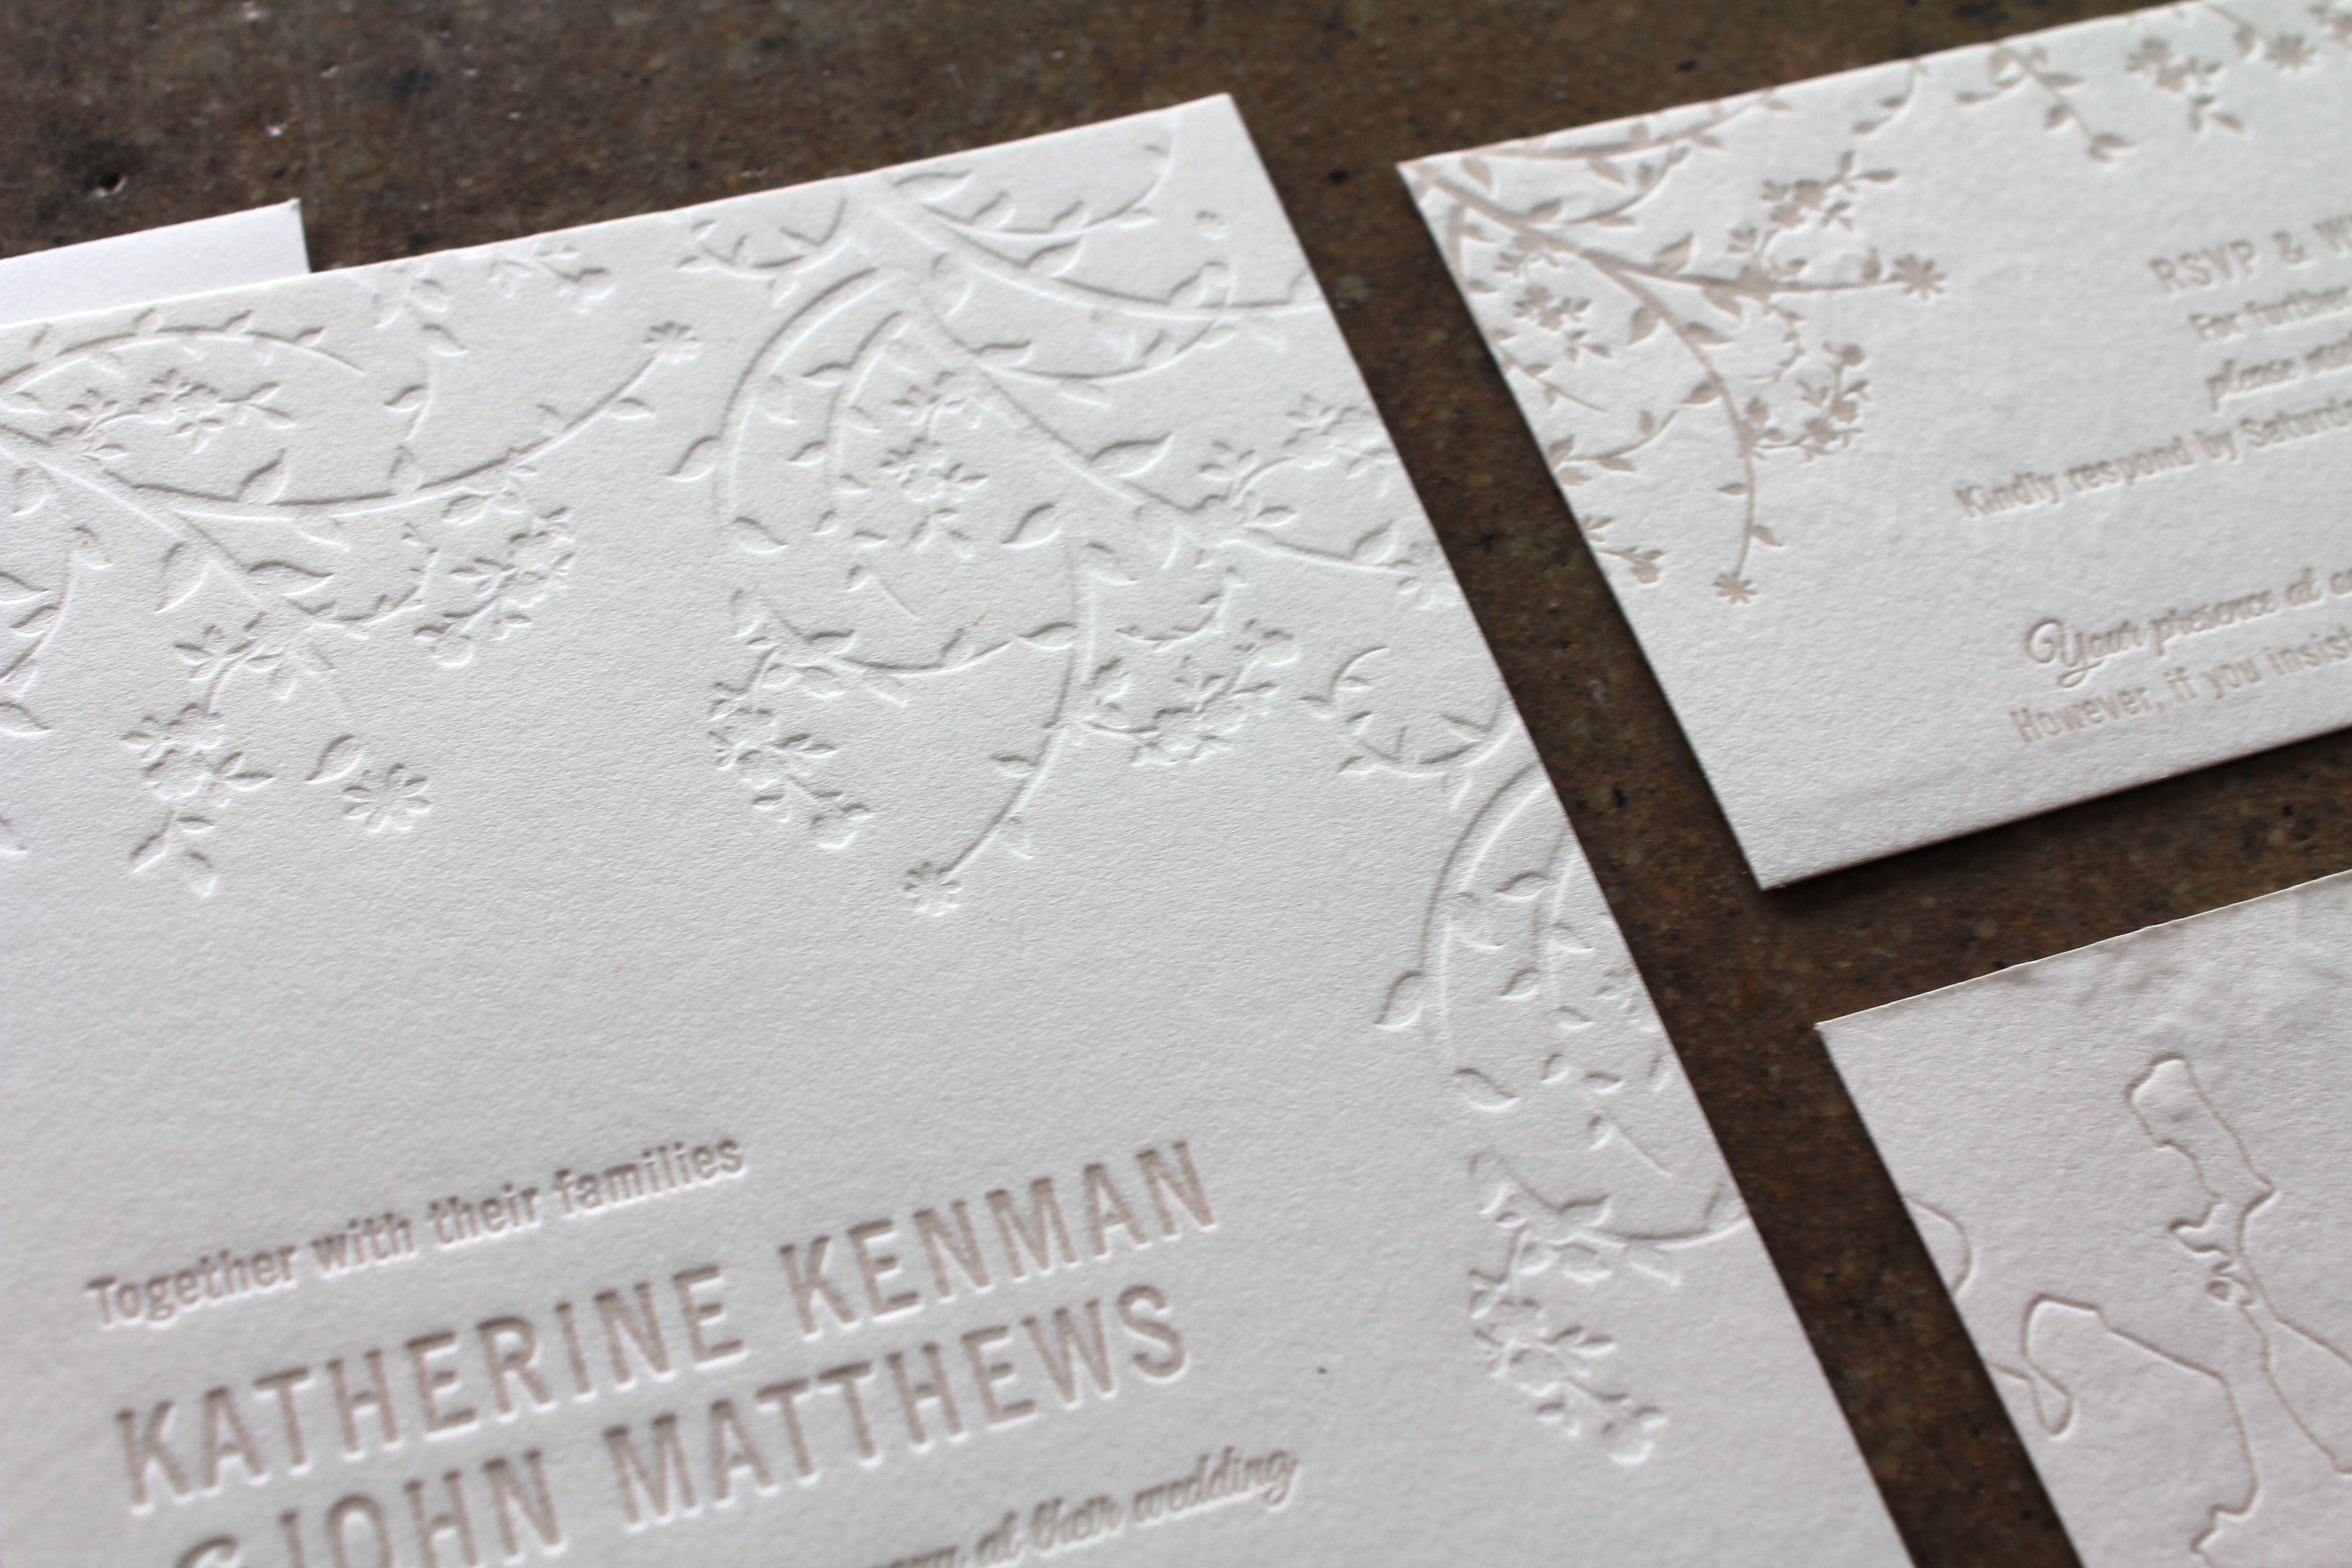 Little peach blind u natural whitsundays letterpress wedding